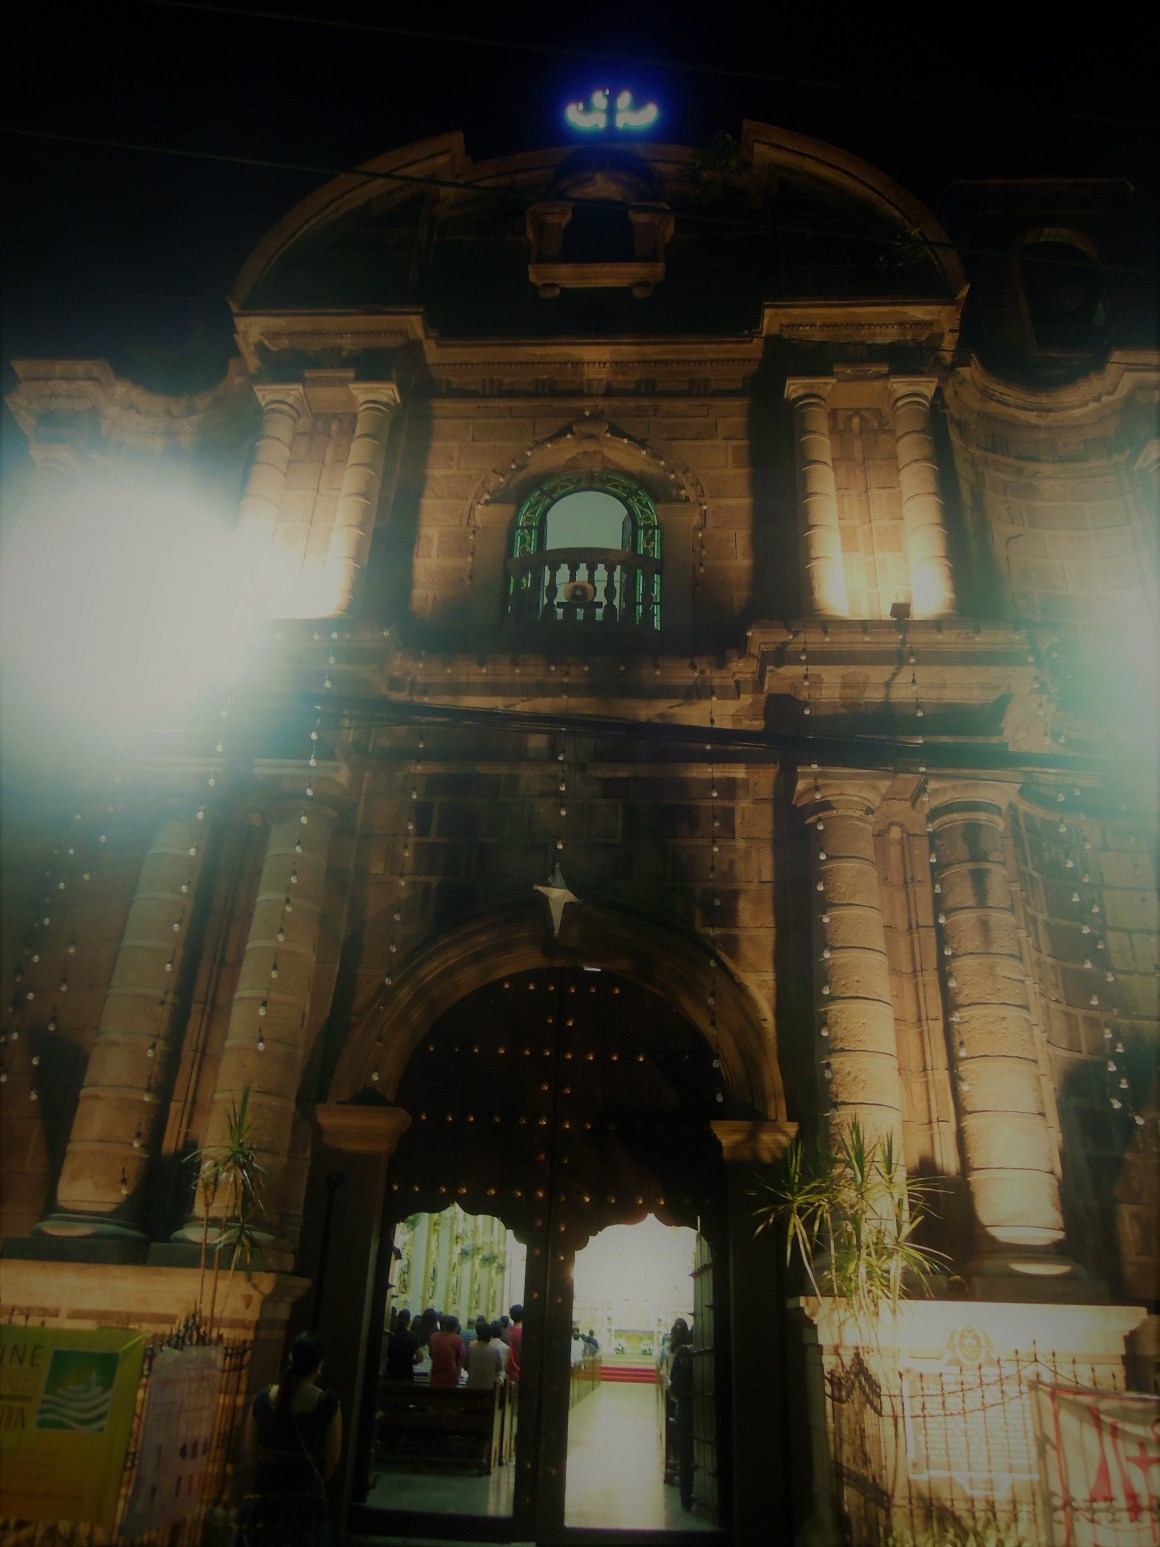 Heritage Series: Poblacion, the Old District of Makati